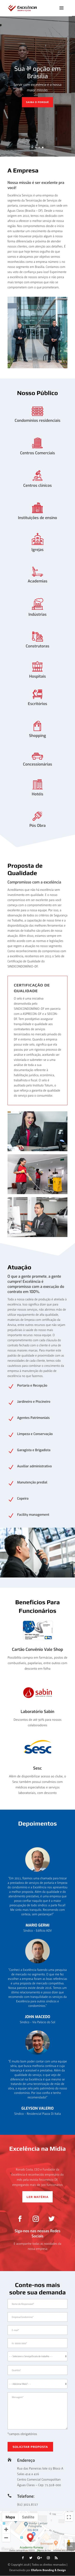 site_excelencia_servicos_02